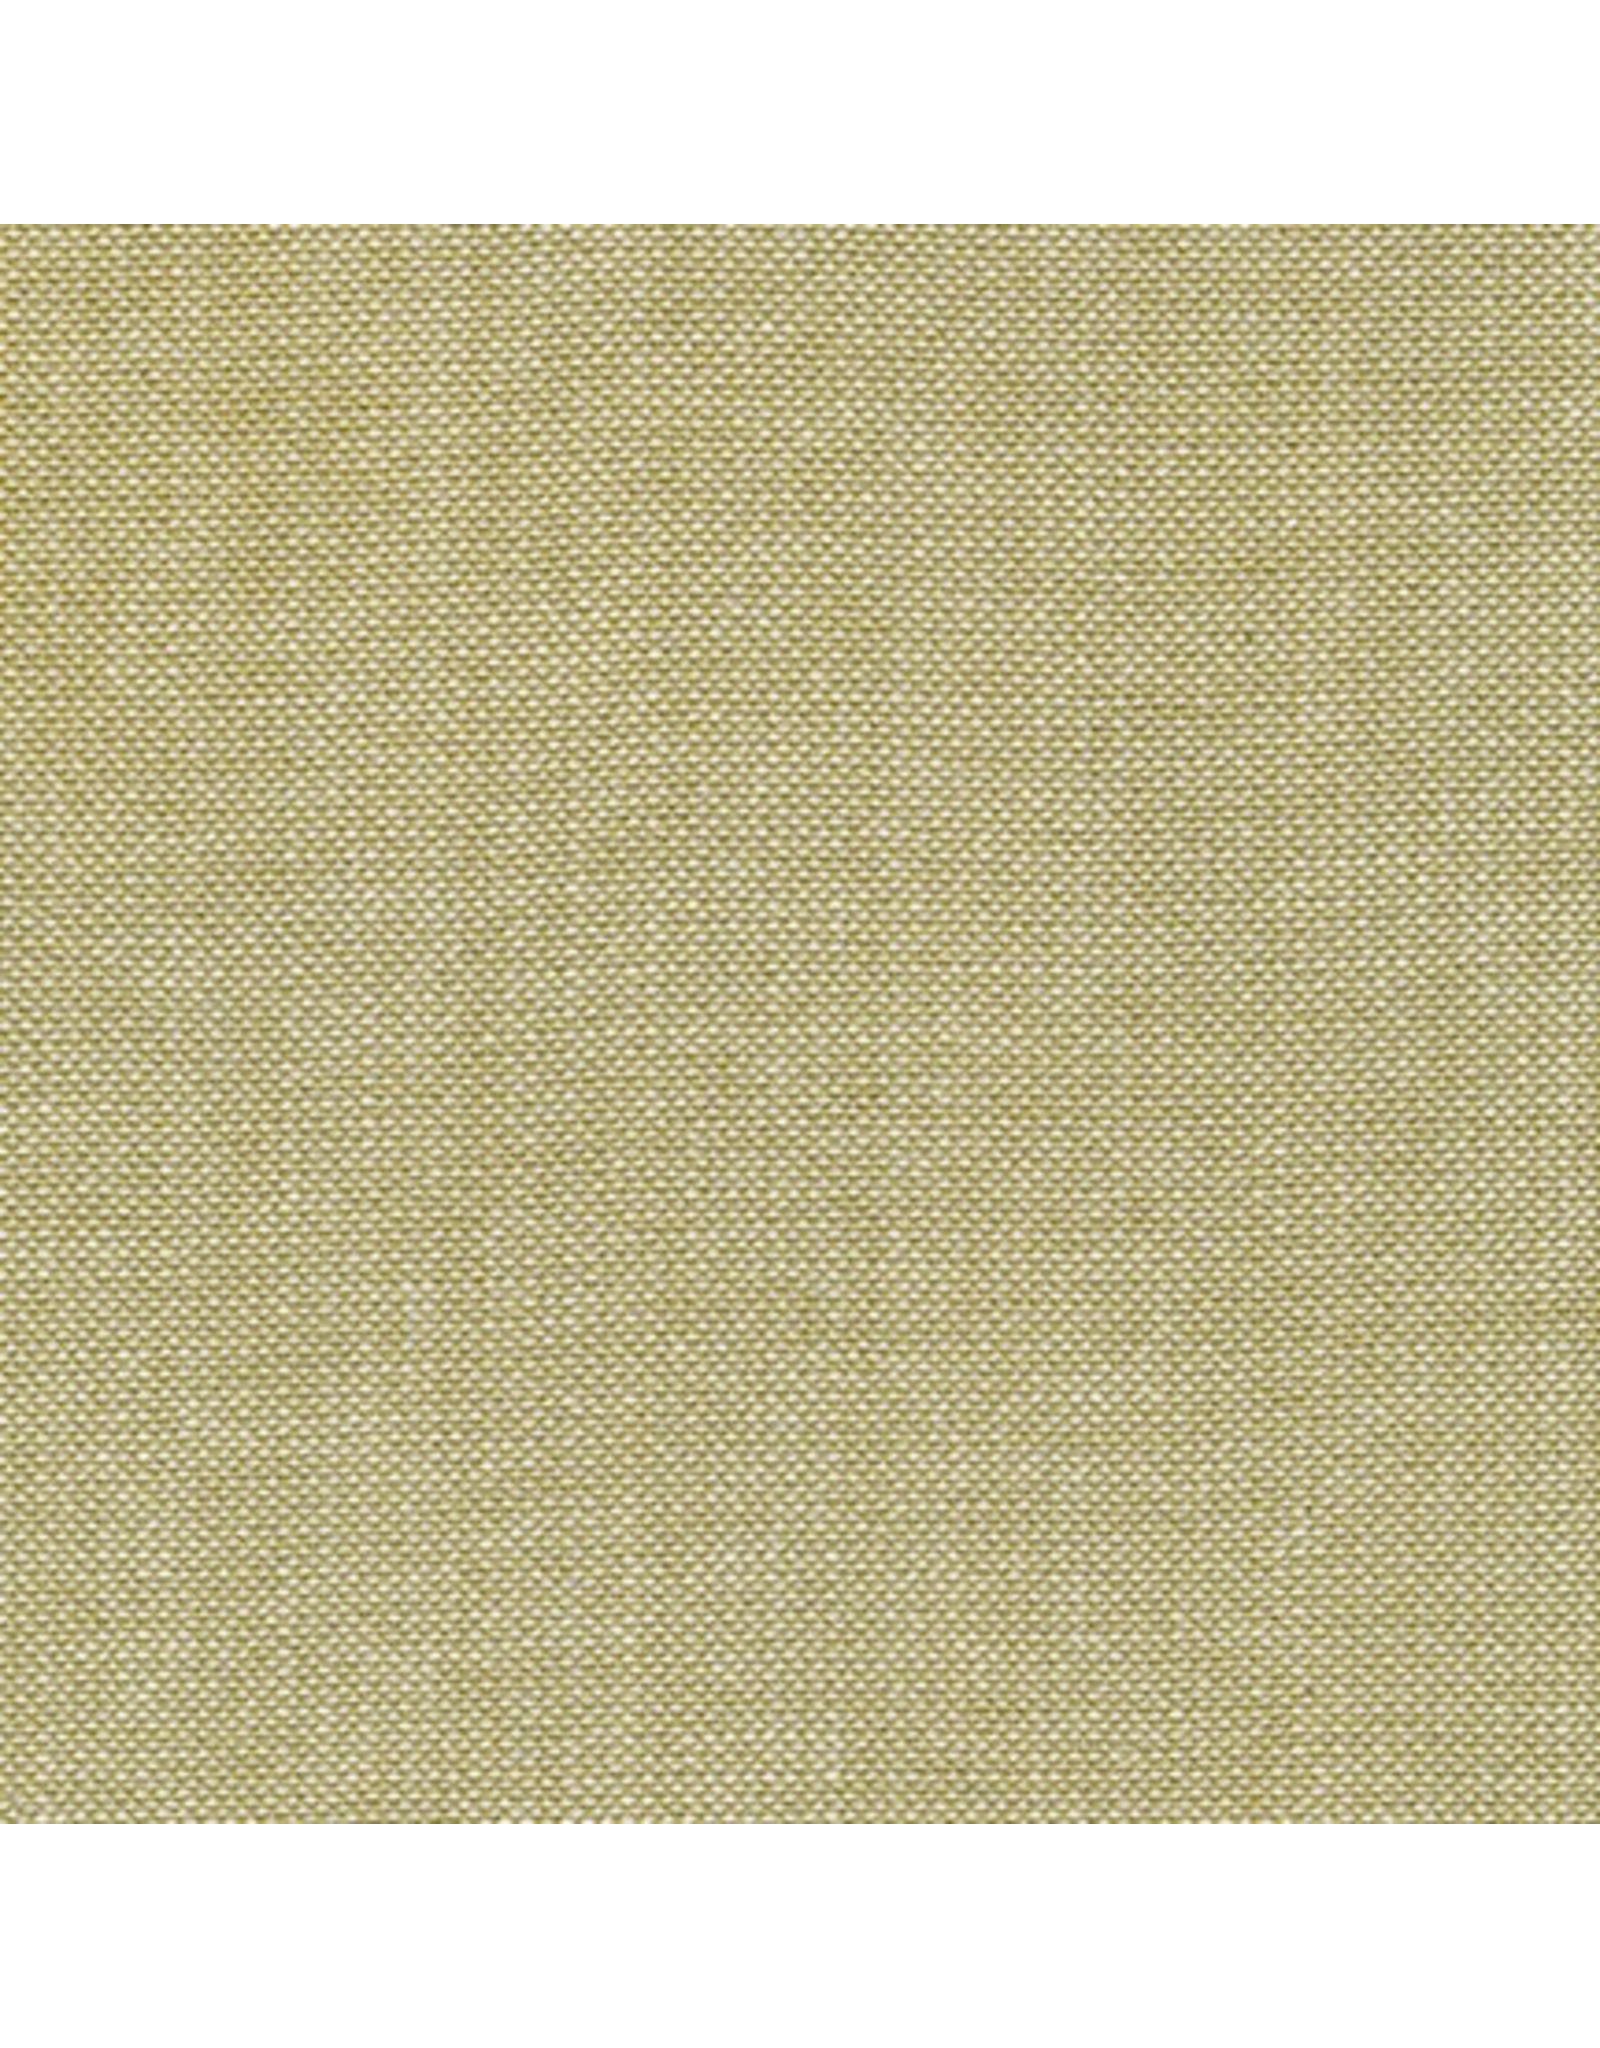 Carolyn Friedlander Harriot Yarn Dyed Woven, Thick Woven in Sweet Pea, Fabric Half-Yards AFR-18110-55